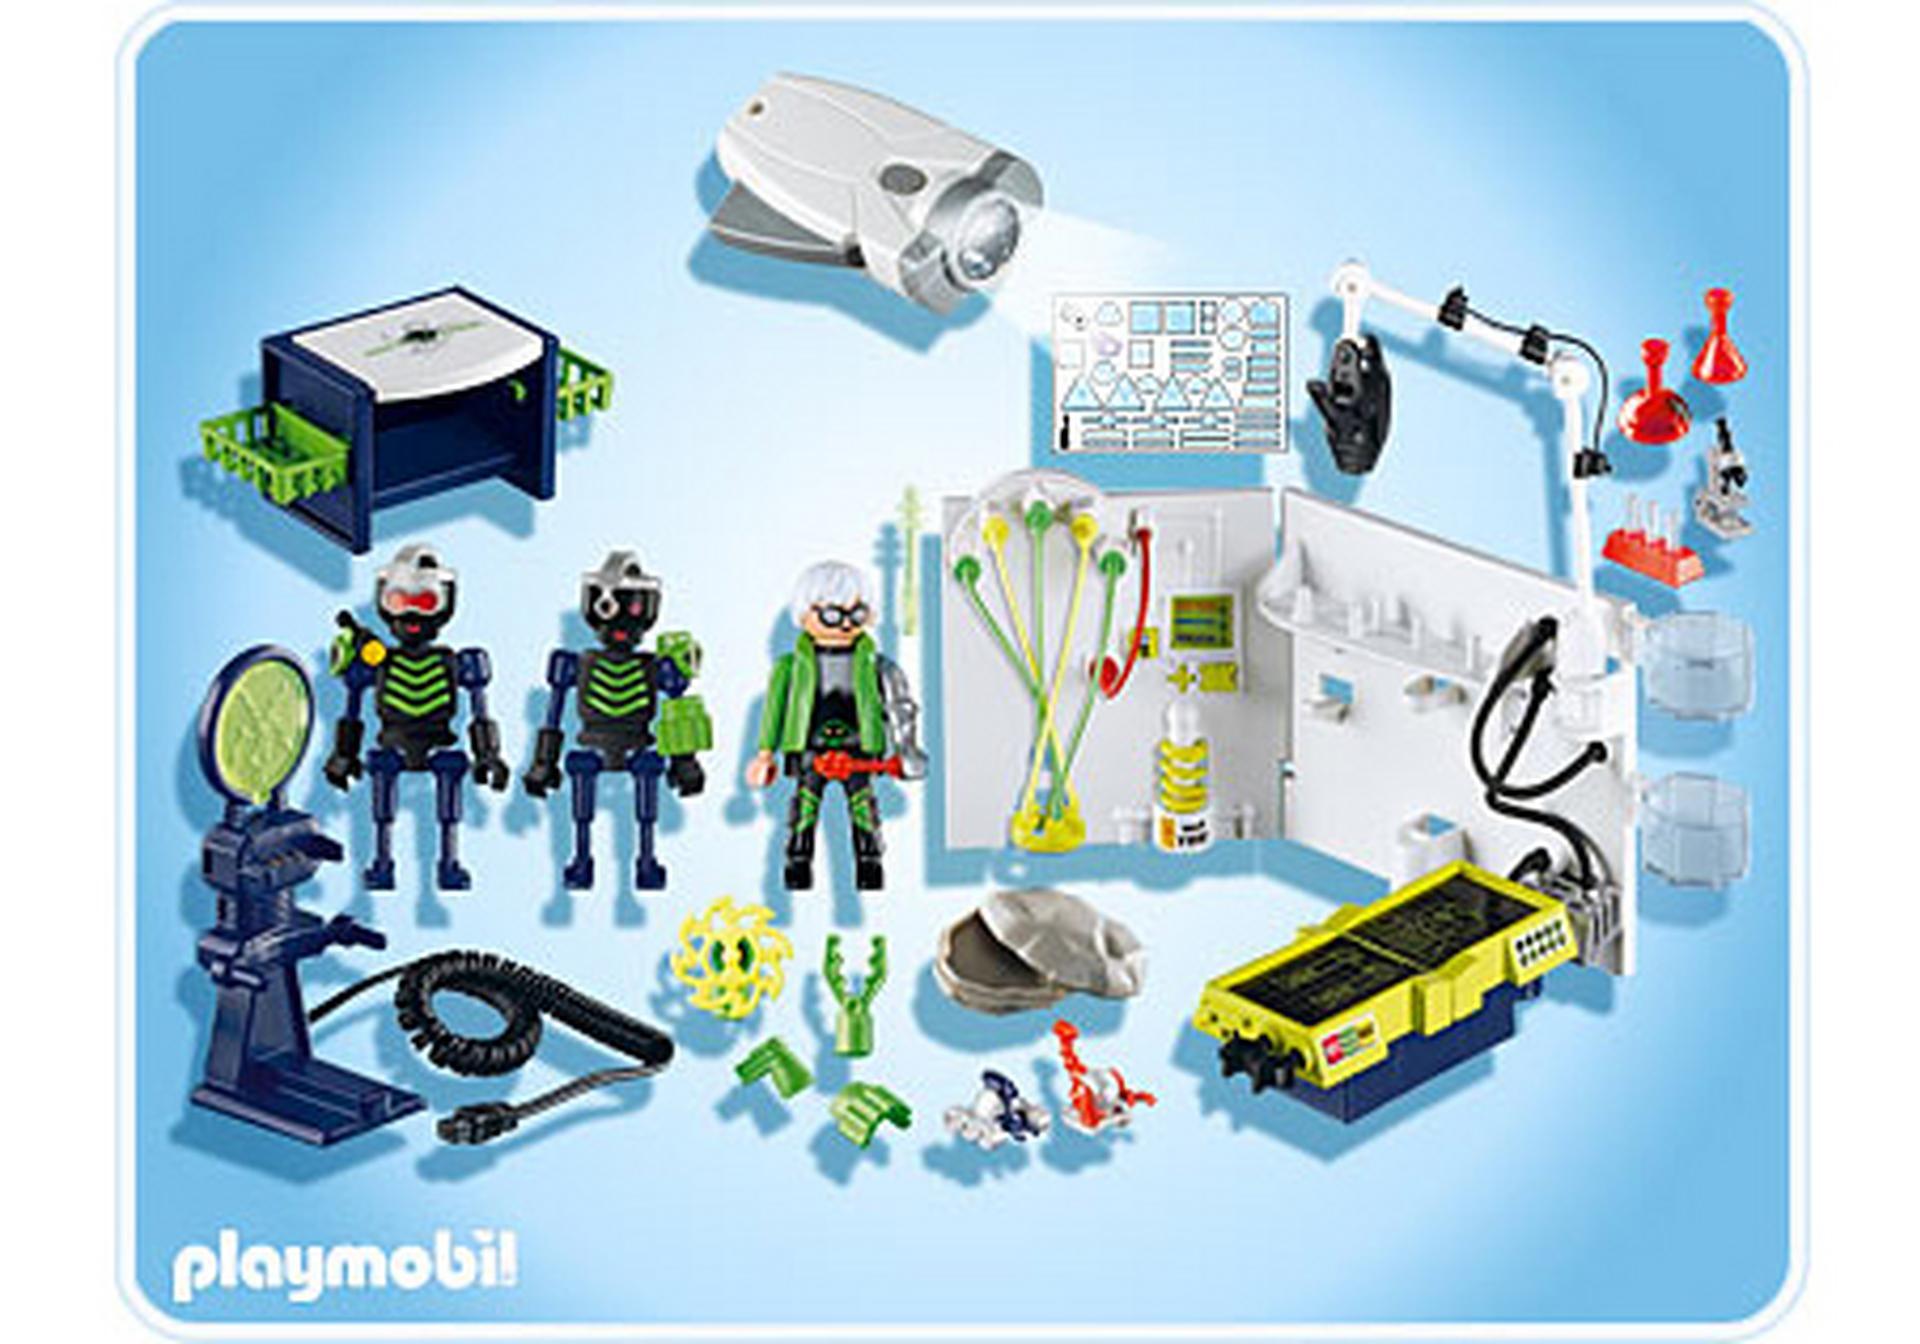 Playmobil Labor